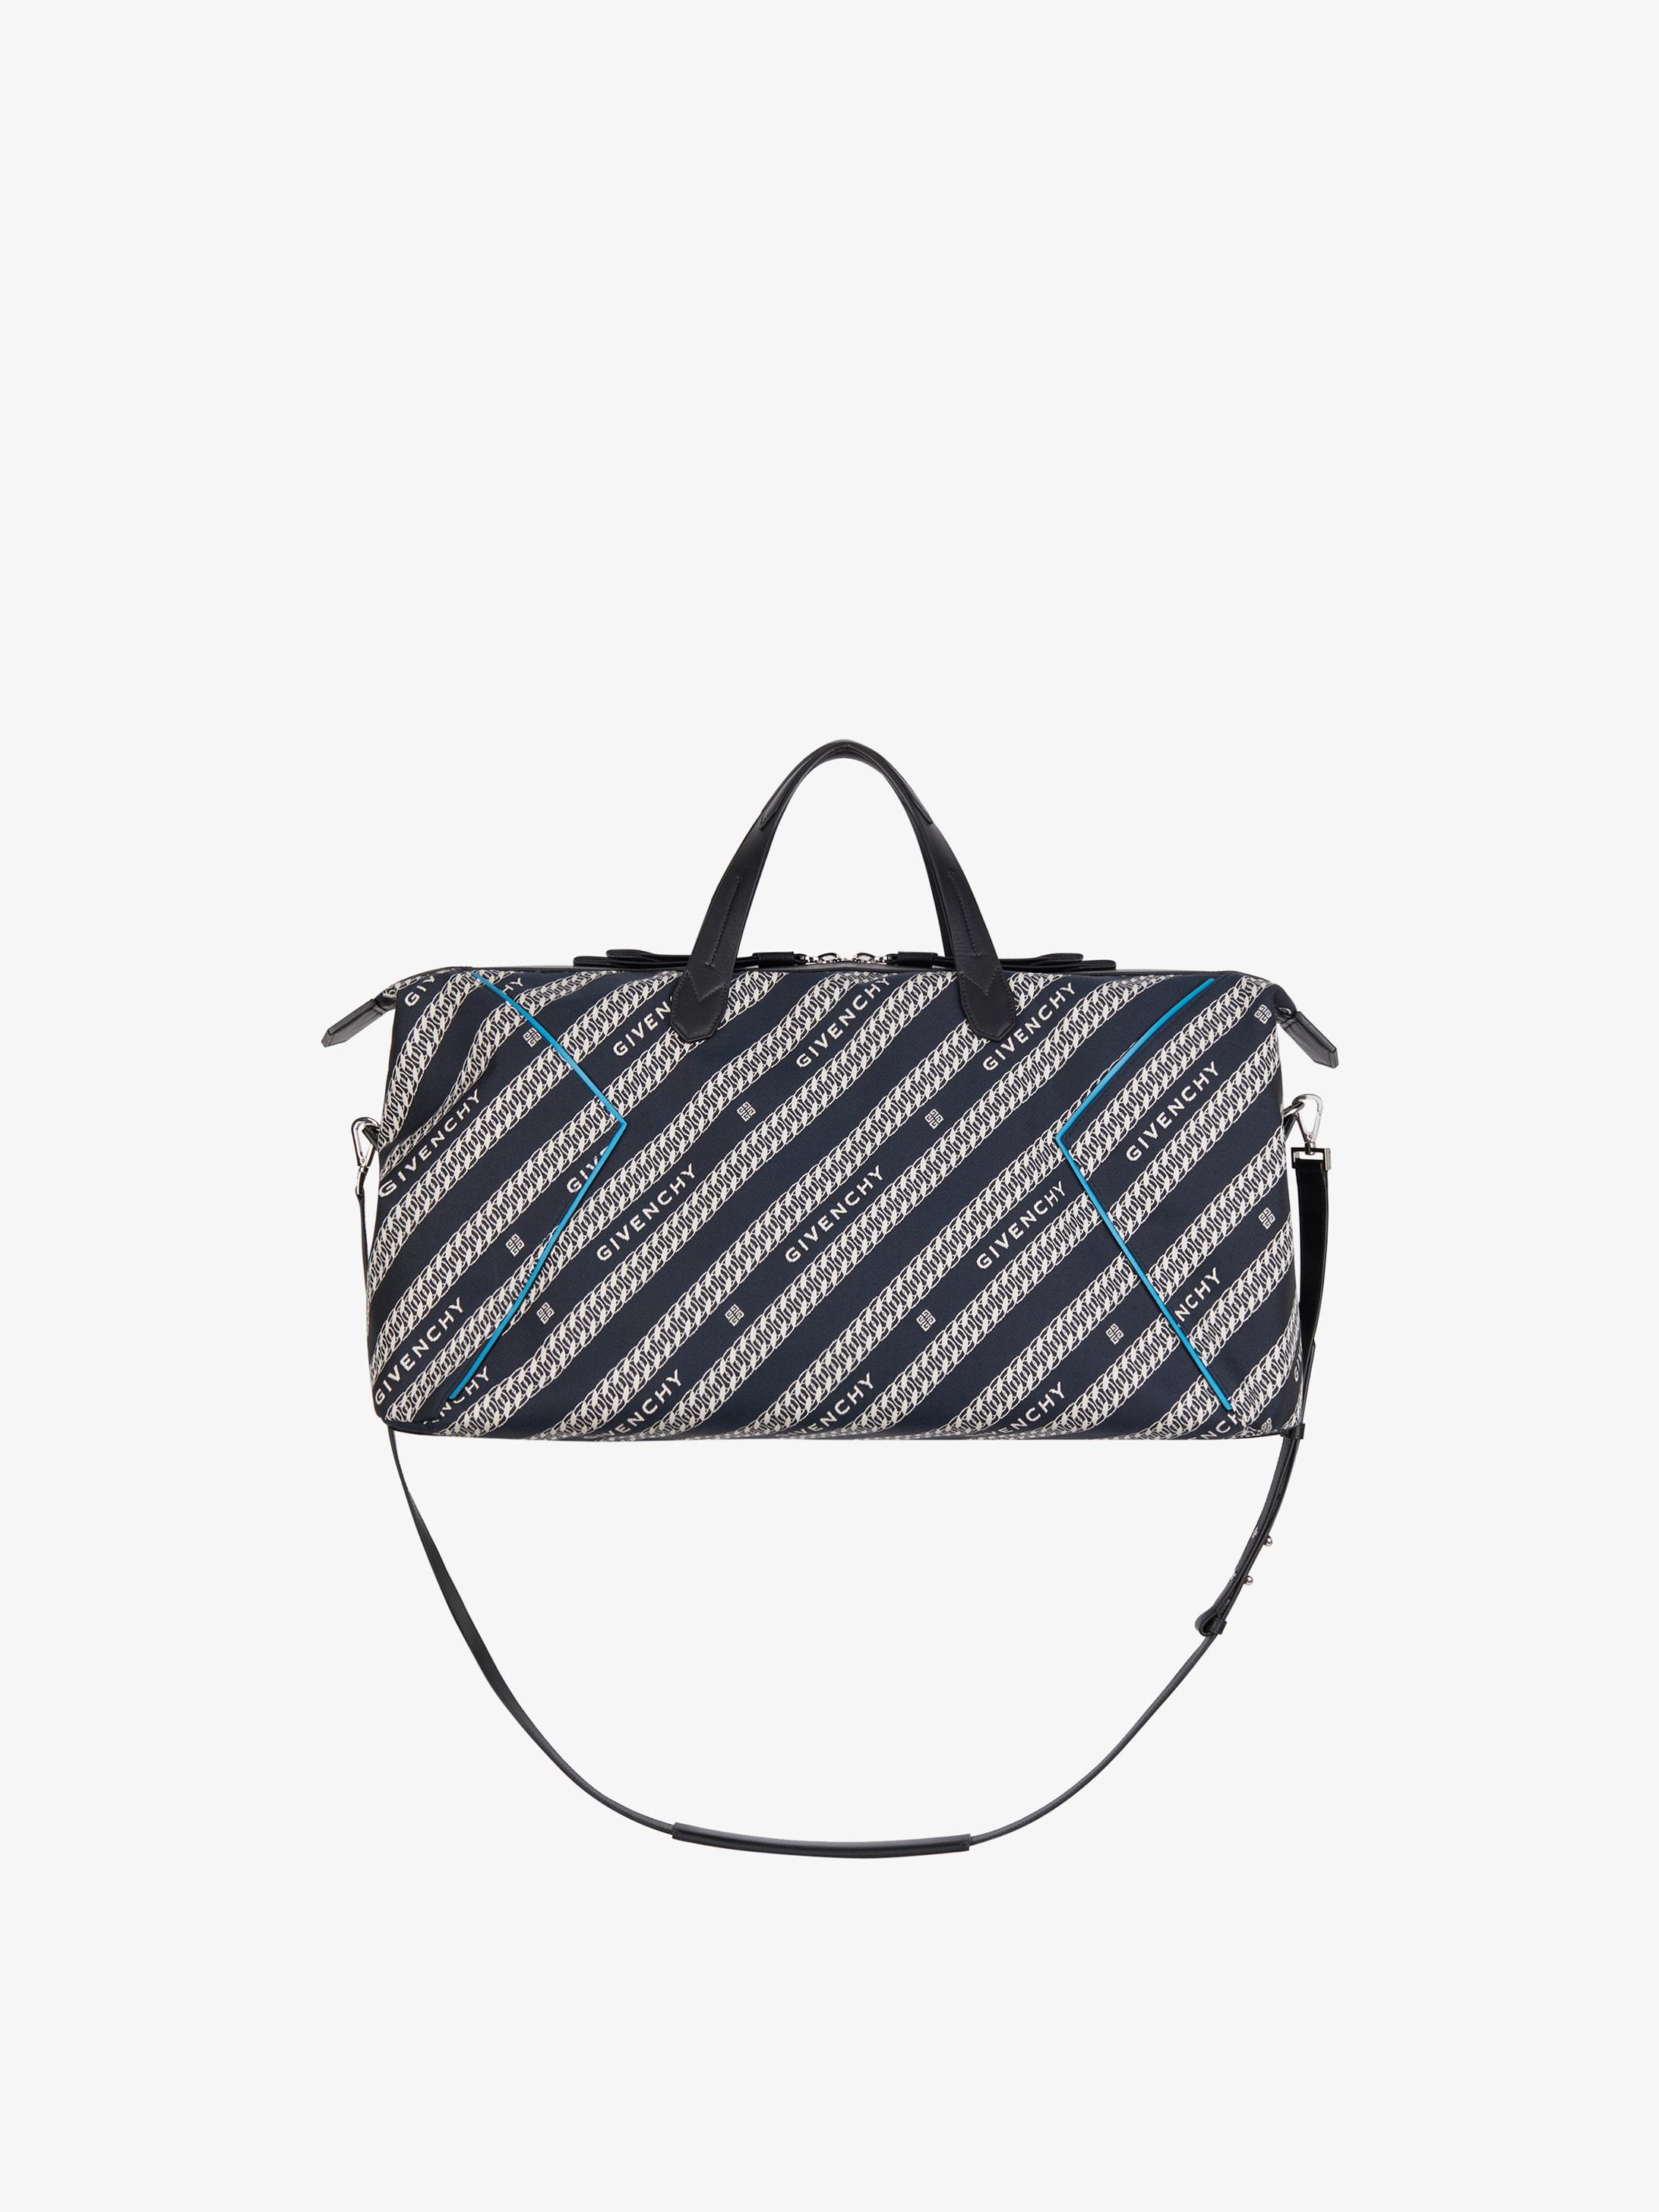 GIVENCHY Bond weekender bag in jacquard